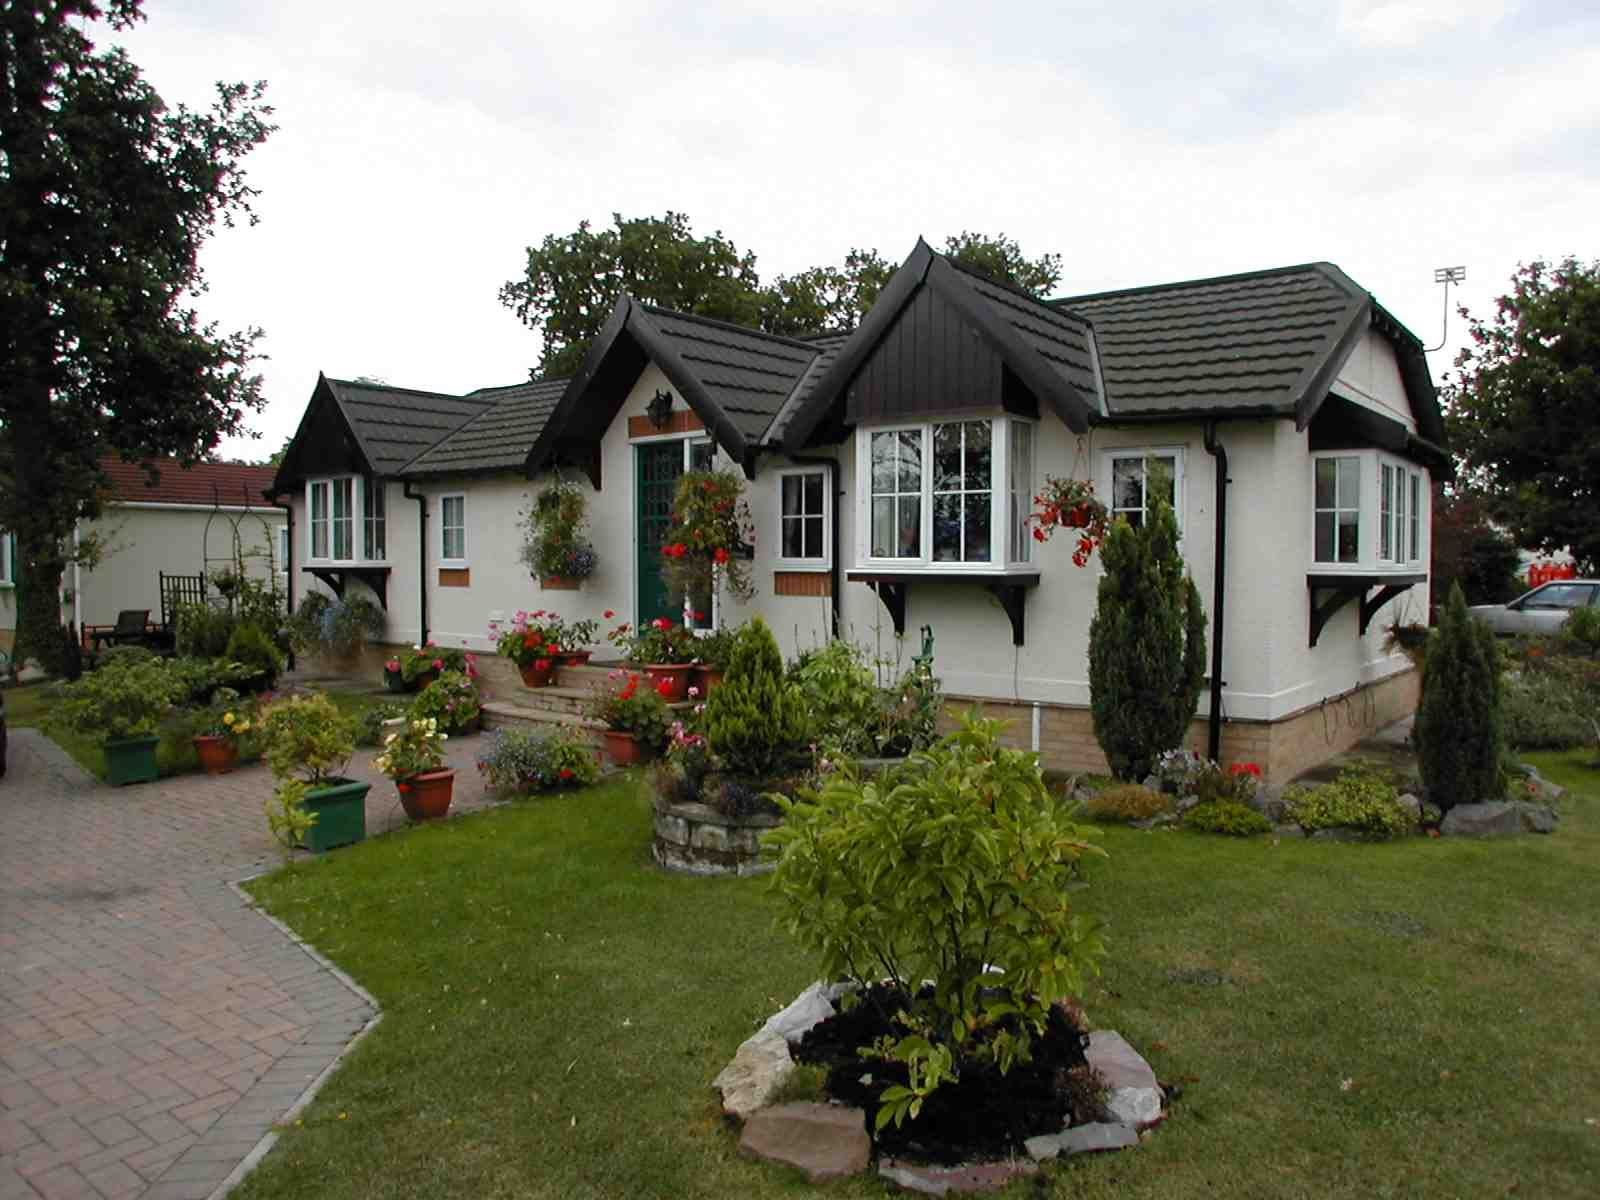 Real Estate Local United Kingdom